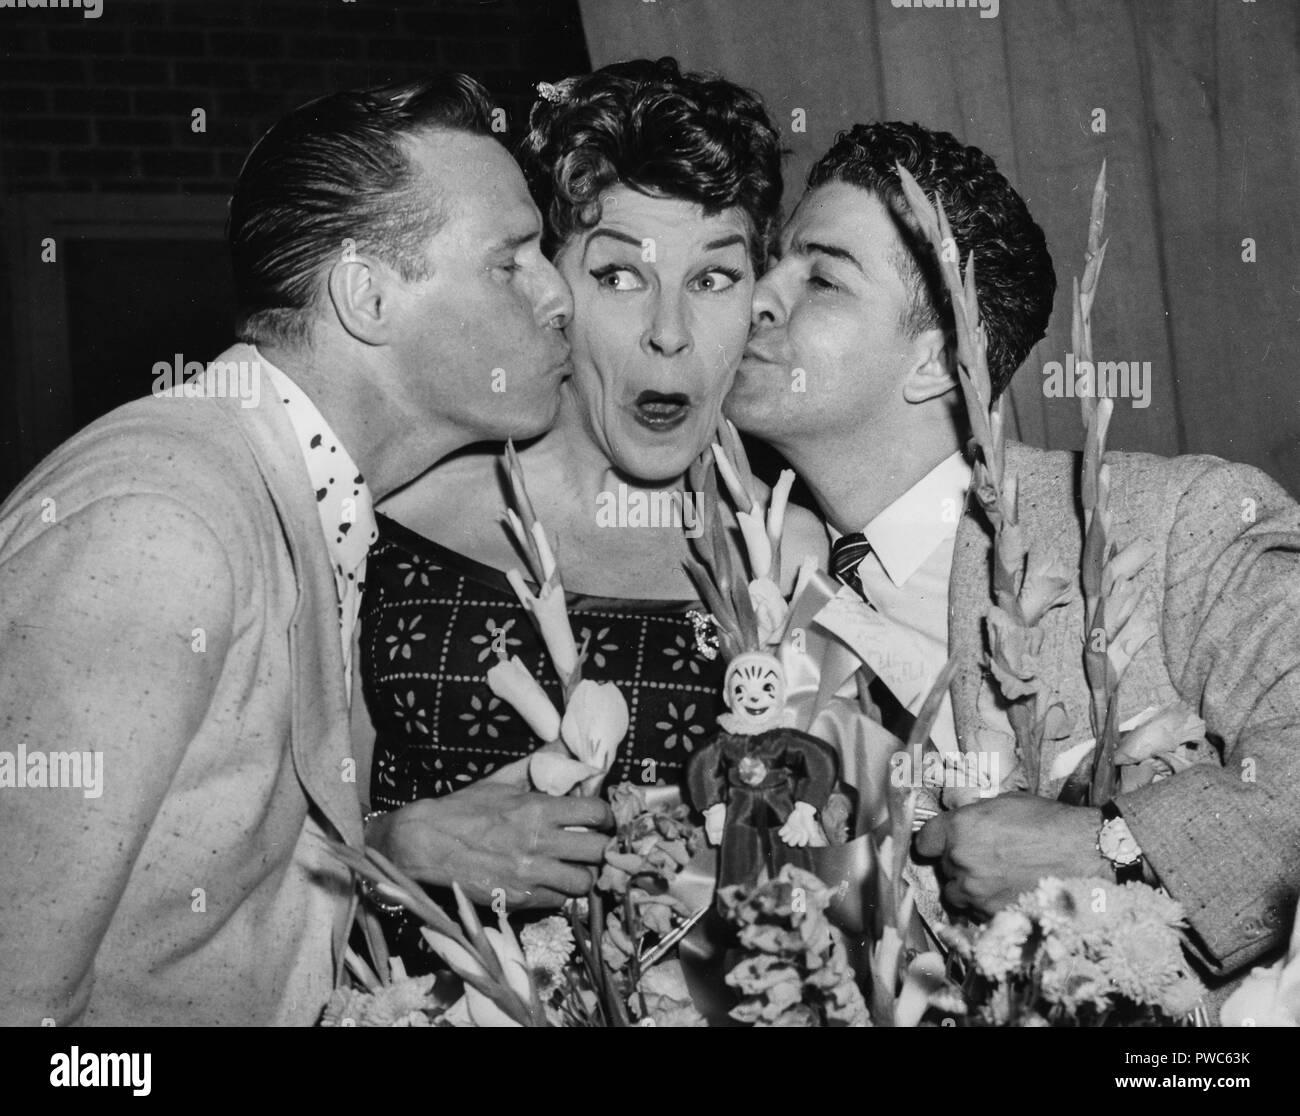 landy arlen, martha raye, vito ruggiero, 1956 - Stock Image